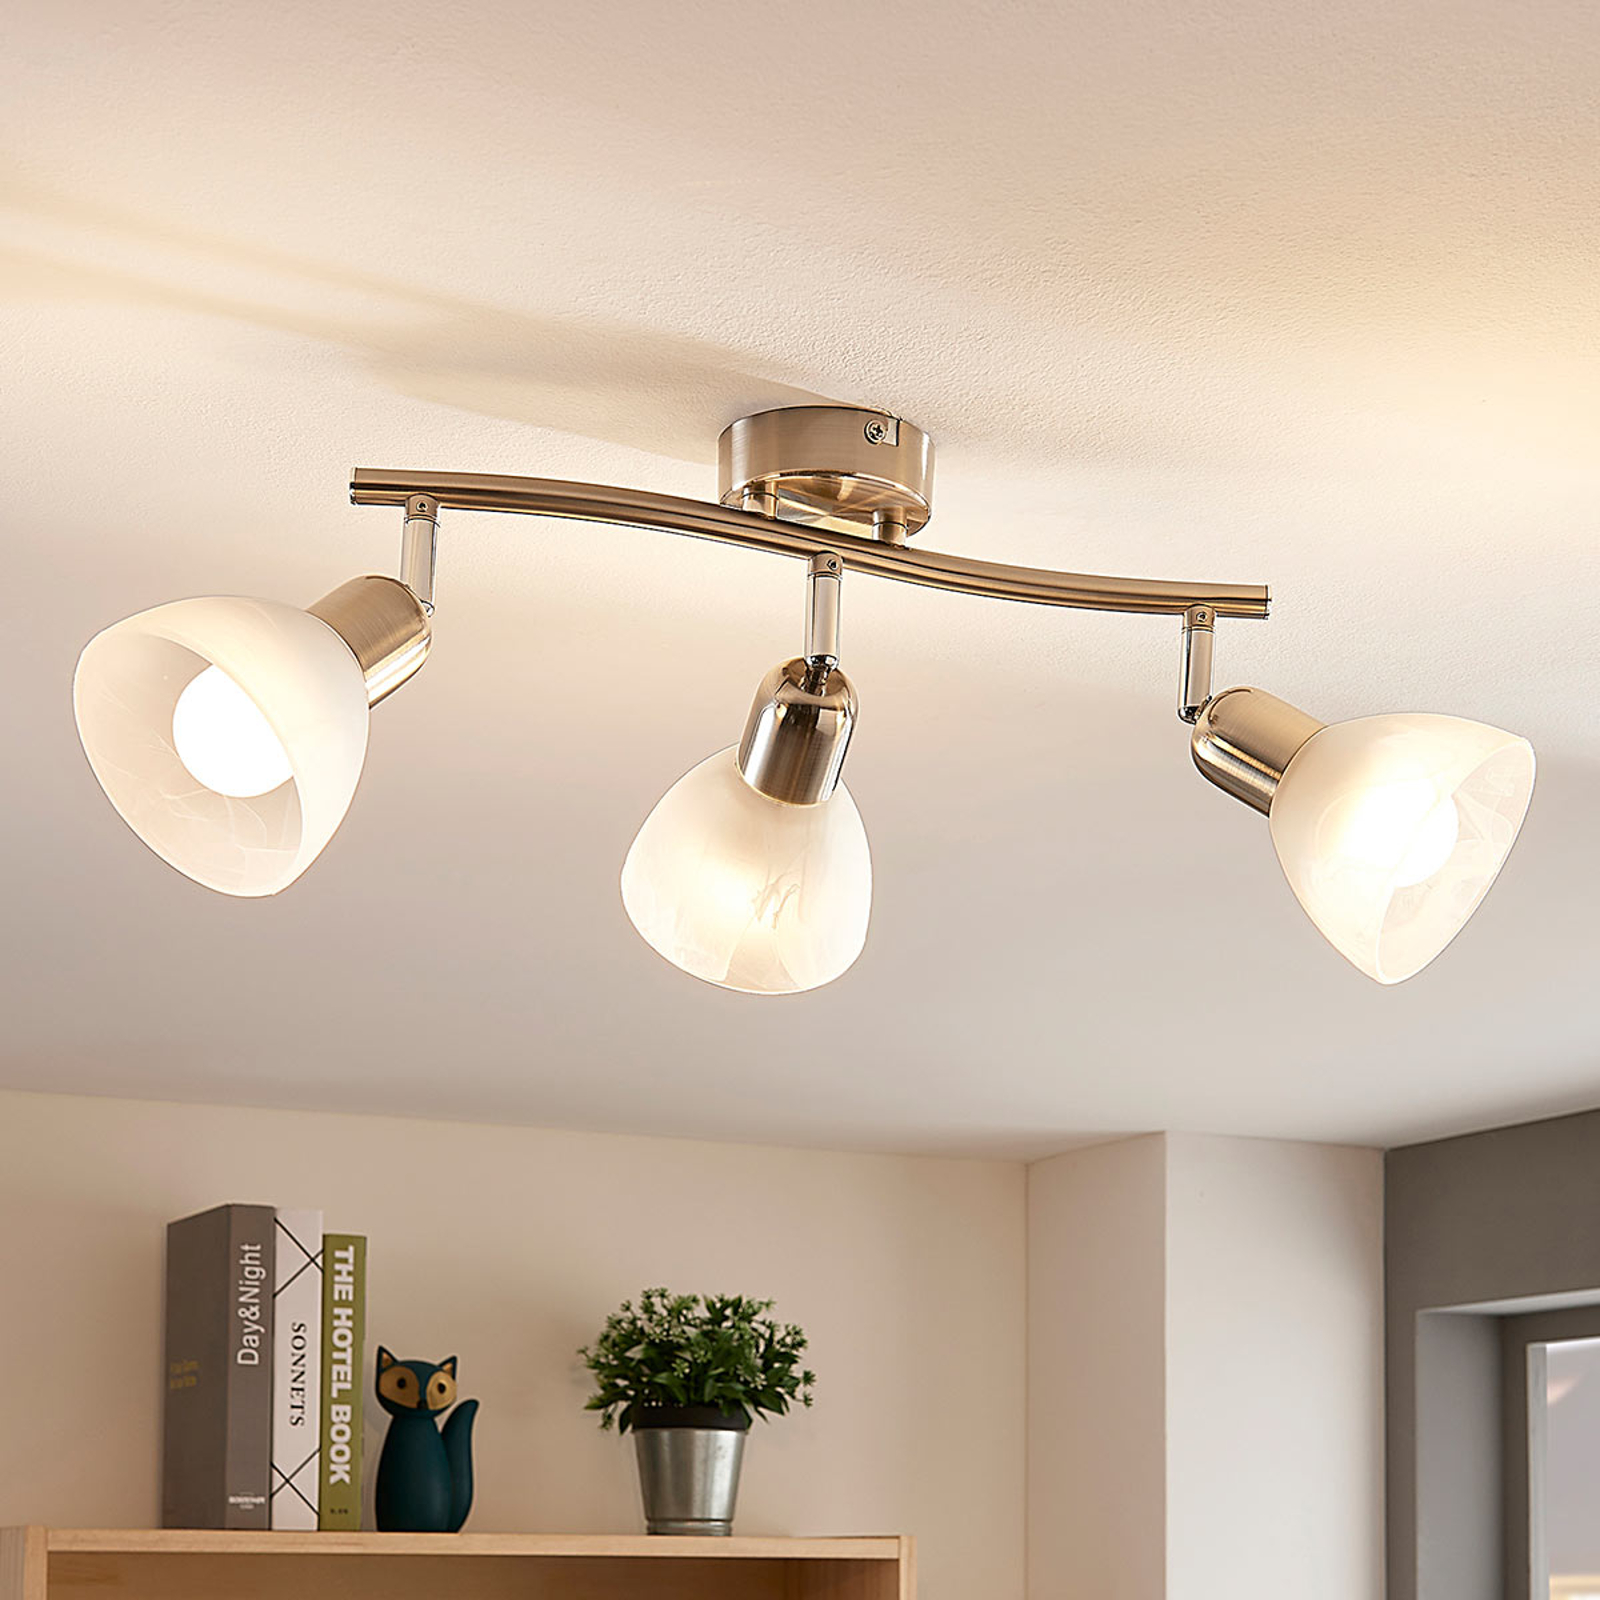 Lindby Paulina LED plafondlamp, 3lamps, langwerpig